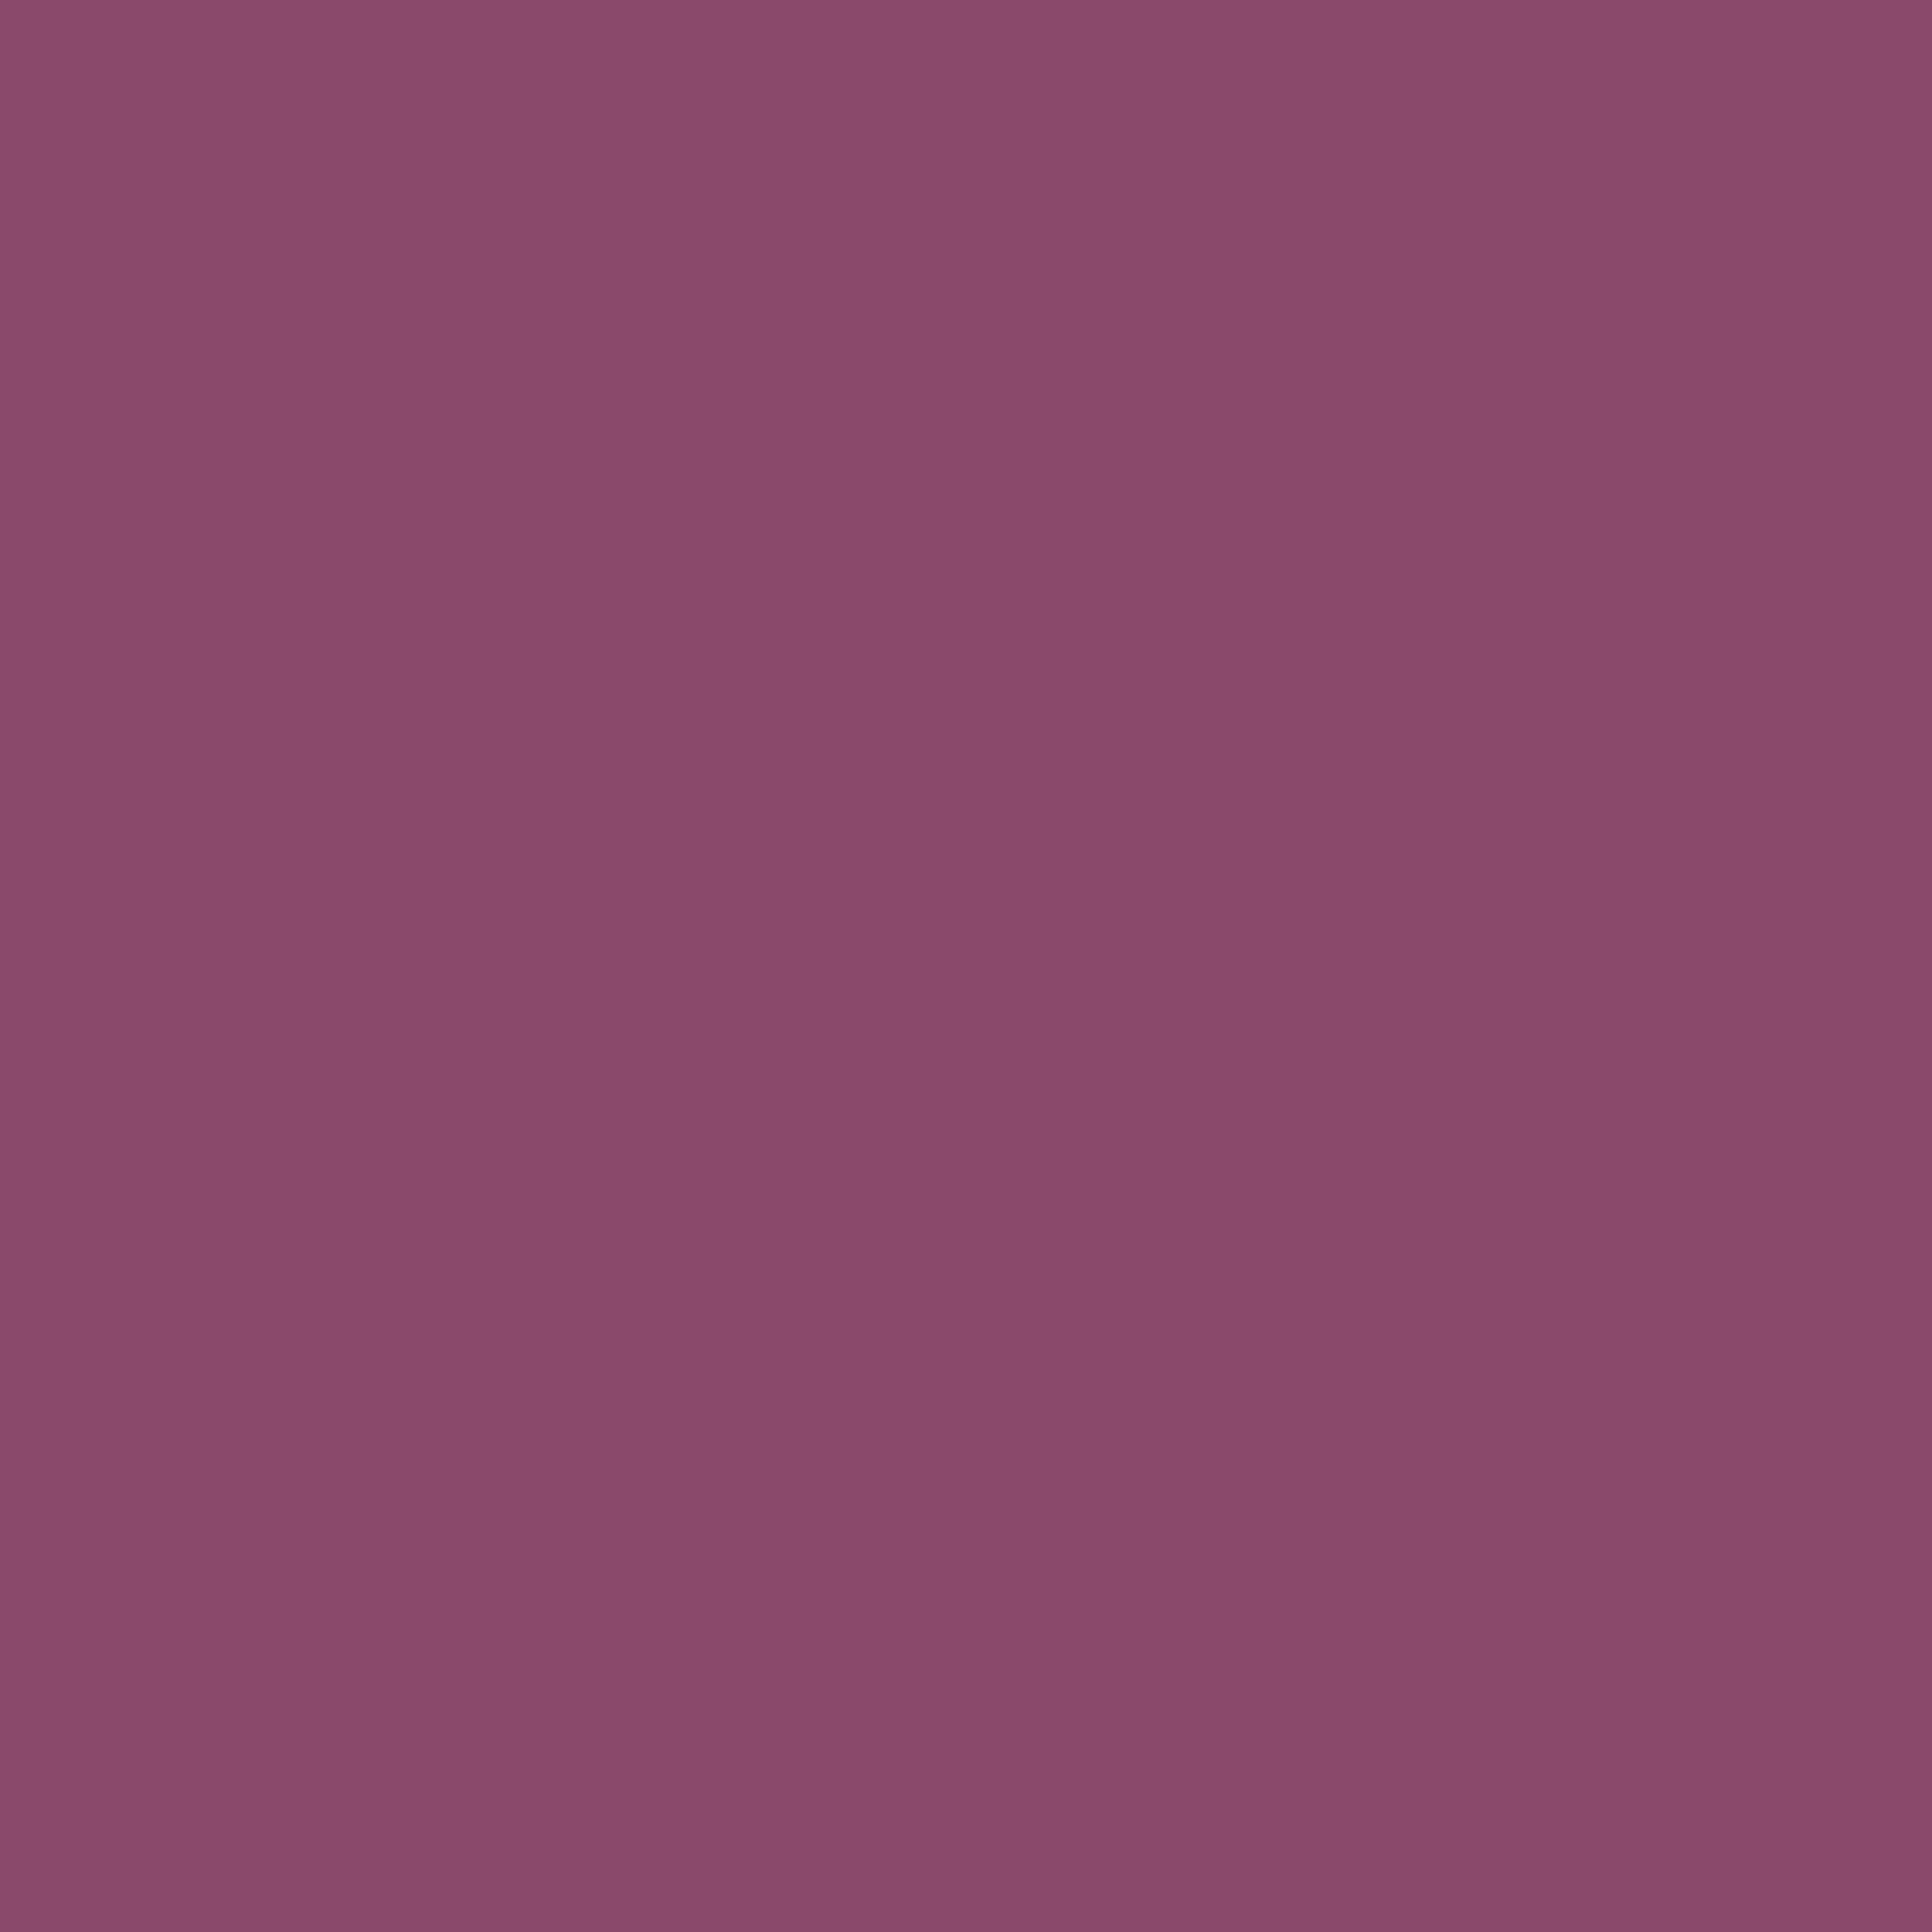 3600x3600 Twilight Lavender Solid Color Background